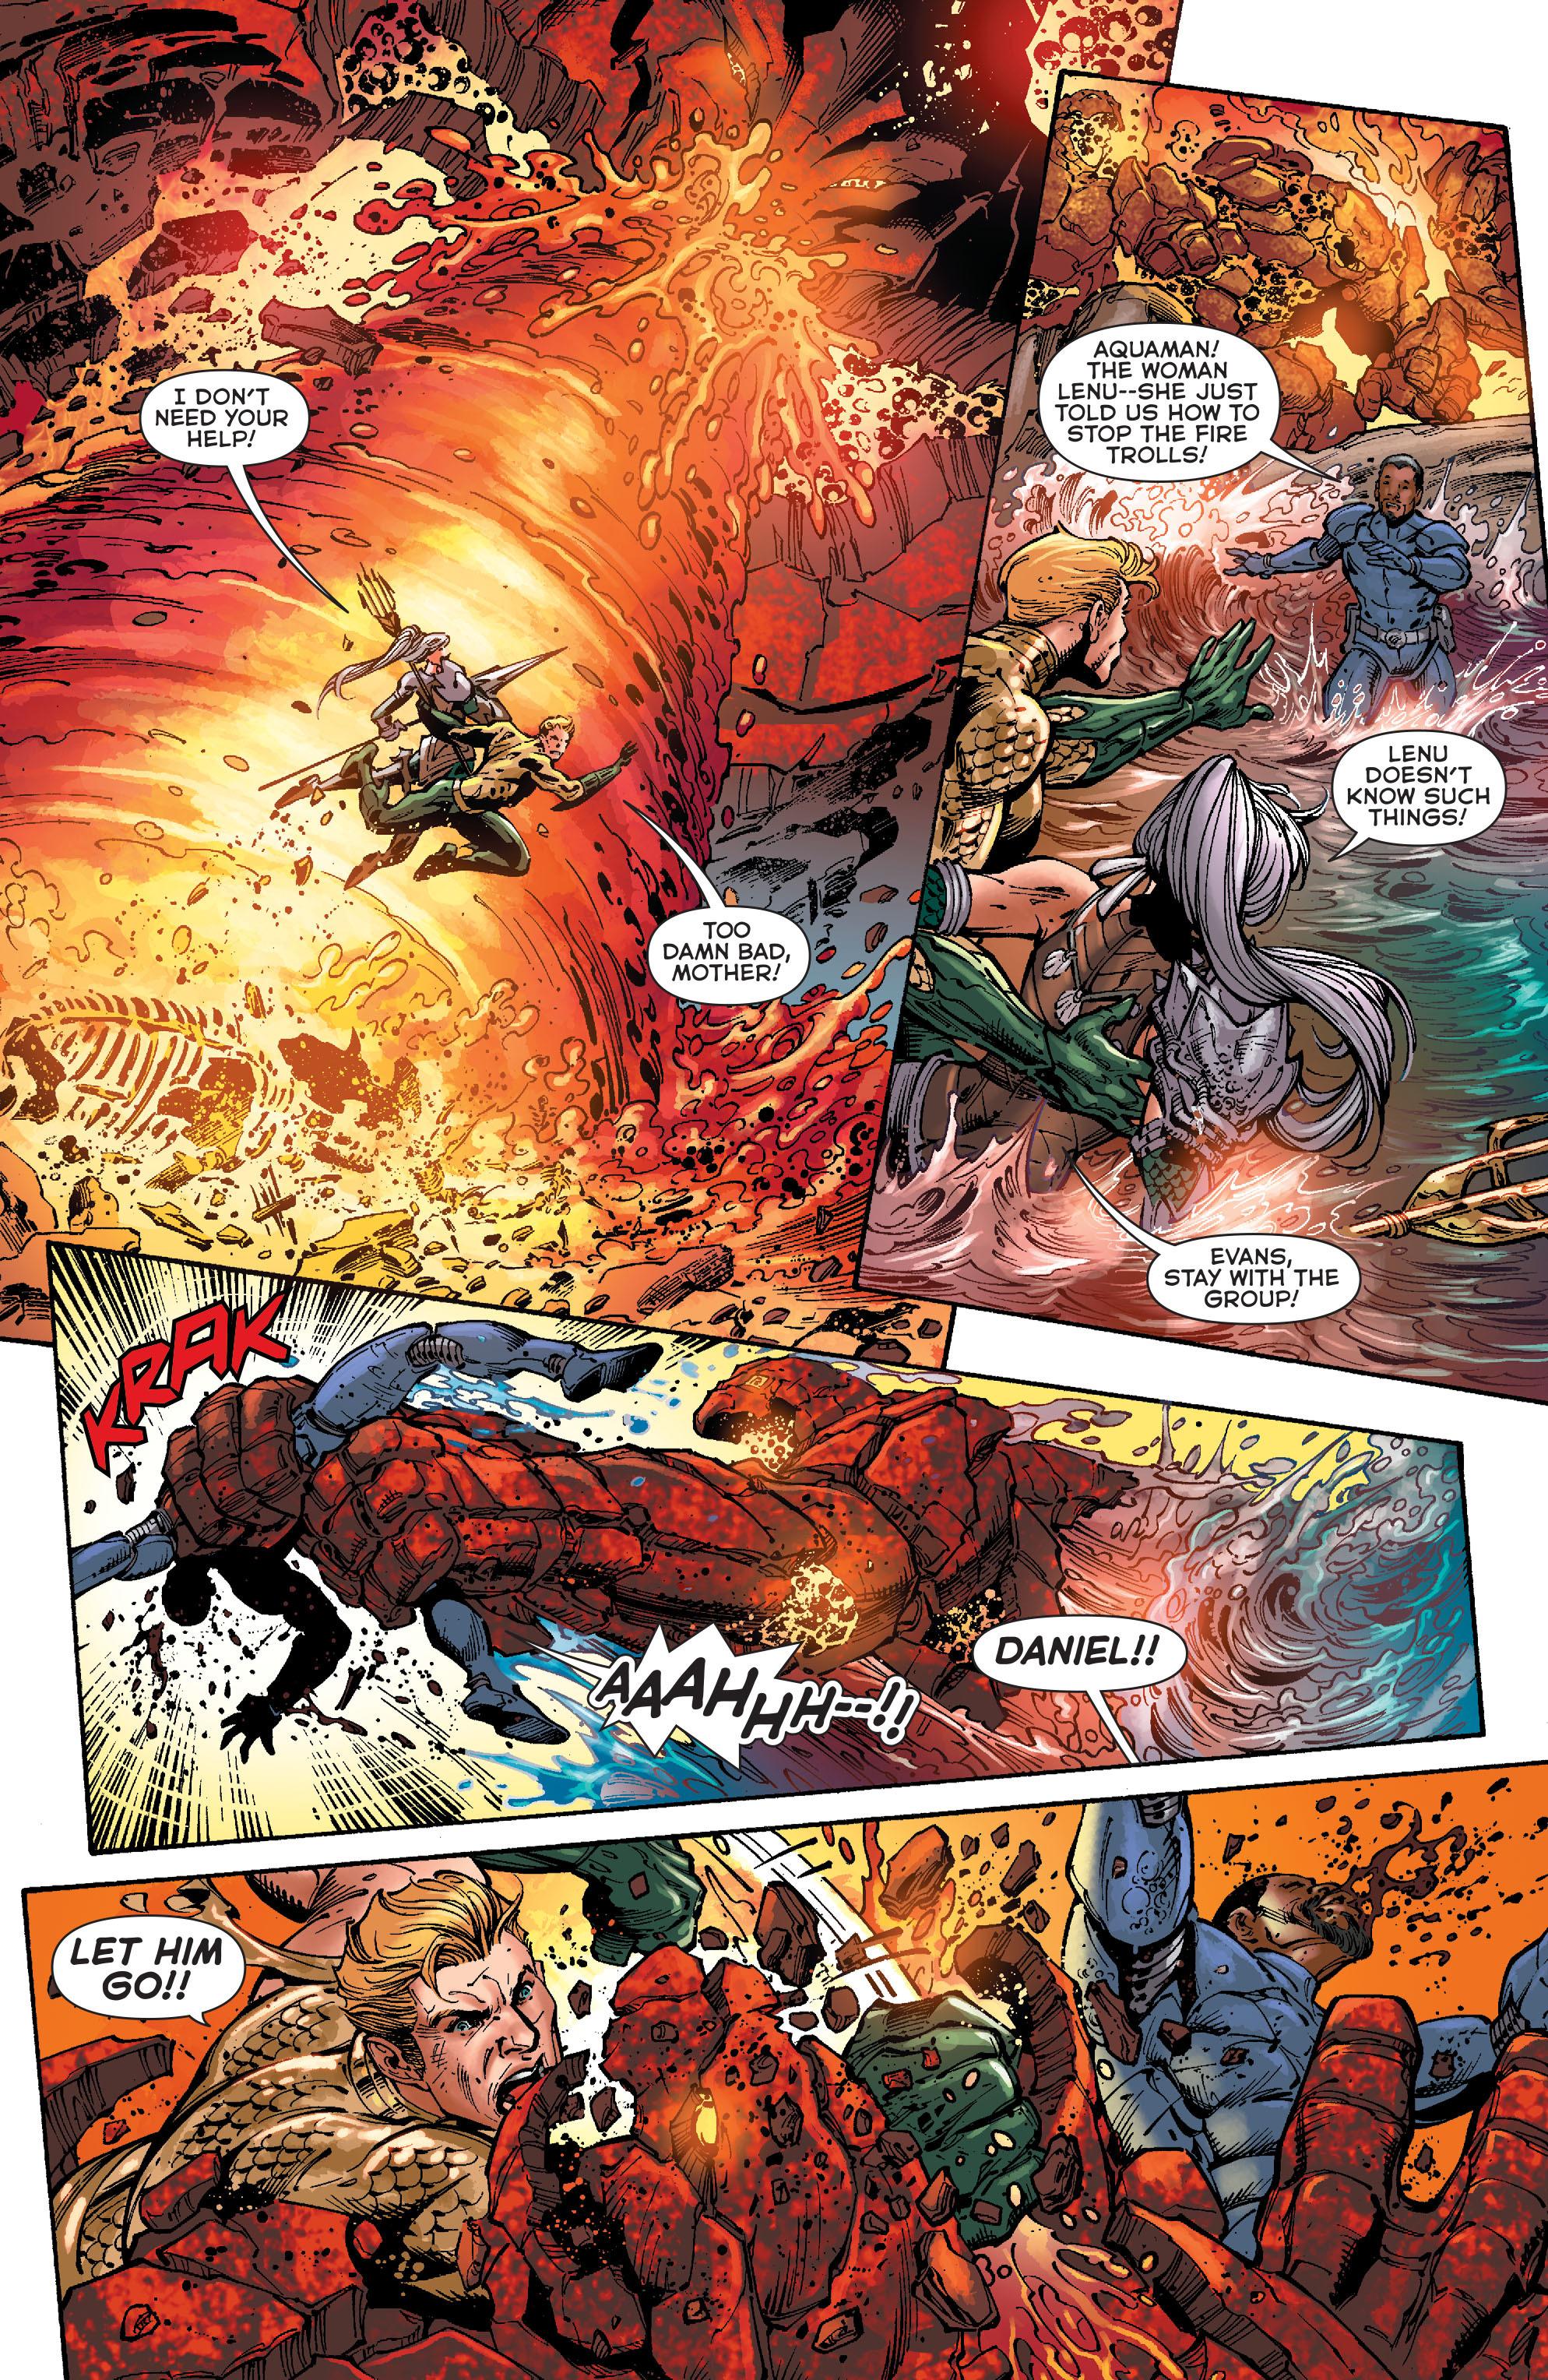 Read online Aquaman (2011) comic -  Issue #40 - 5